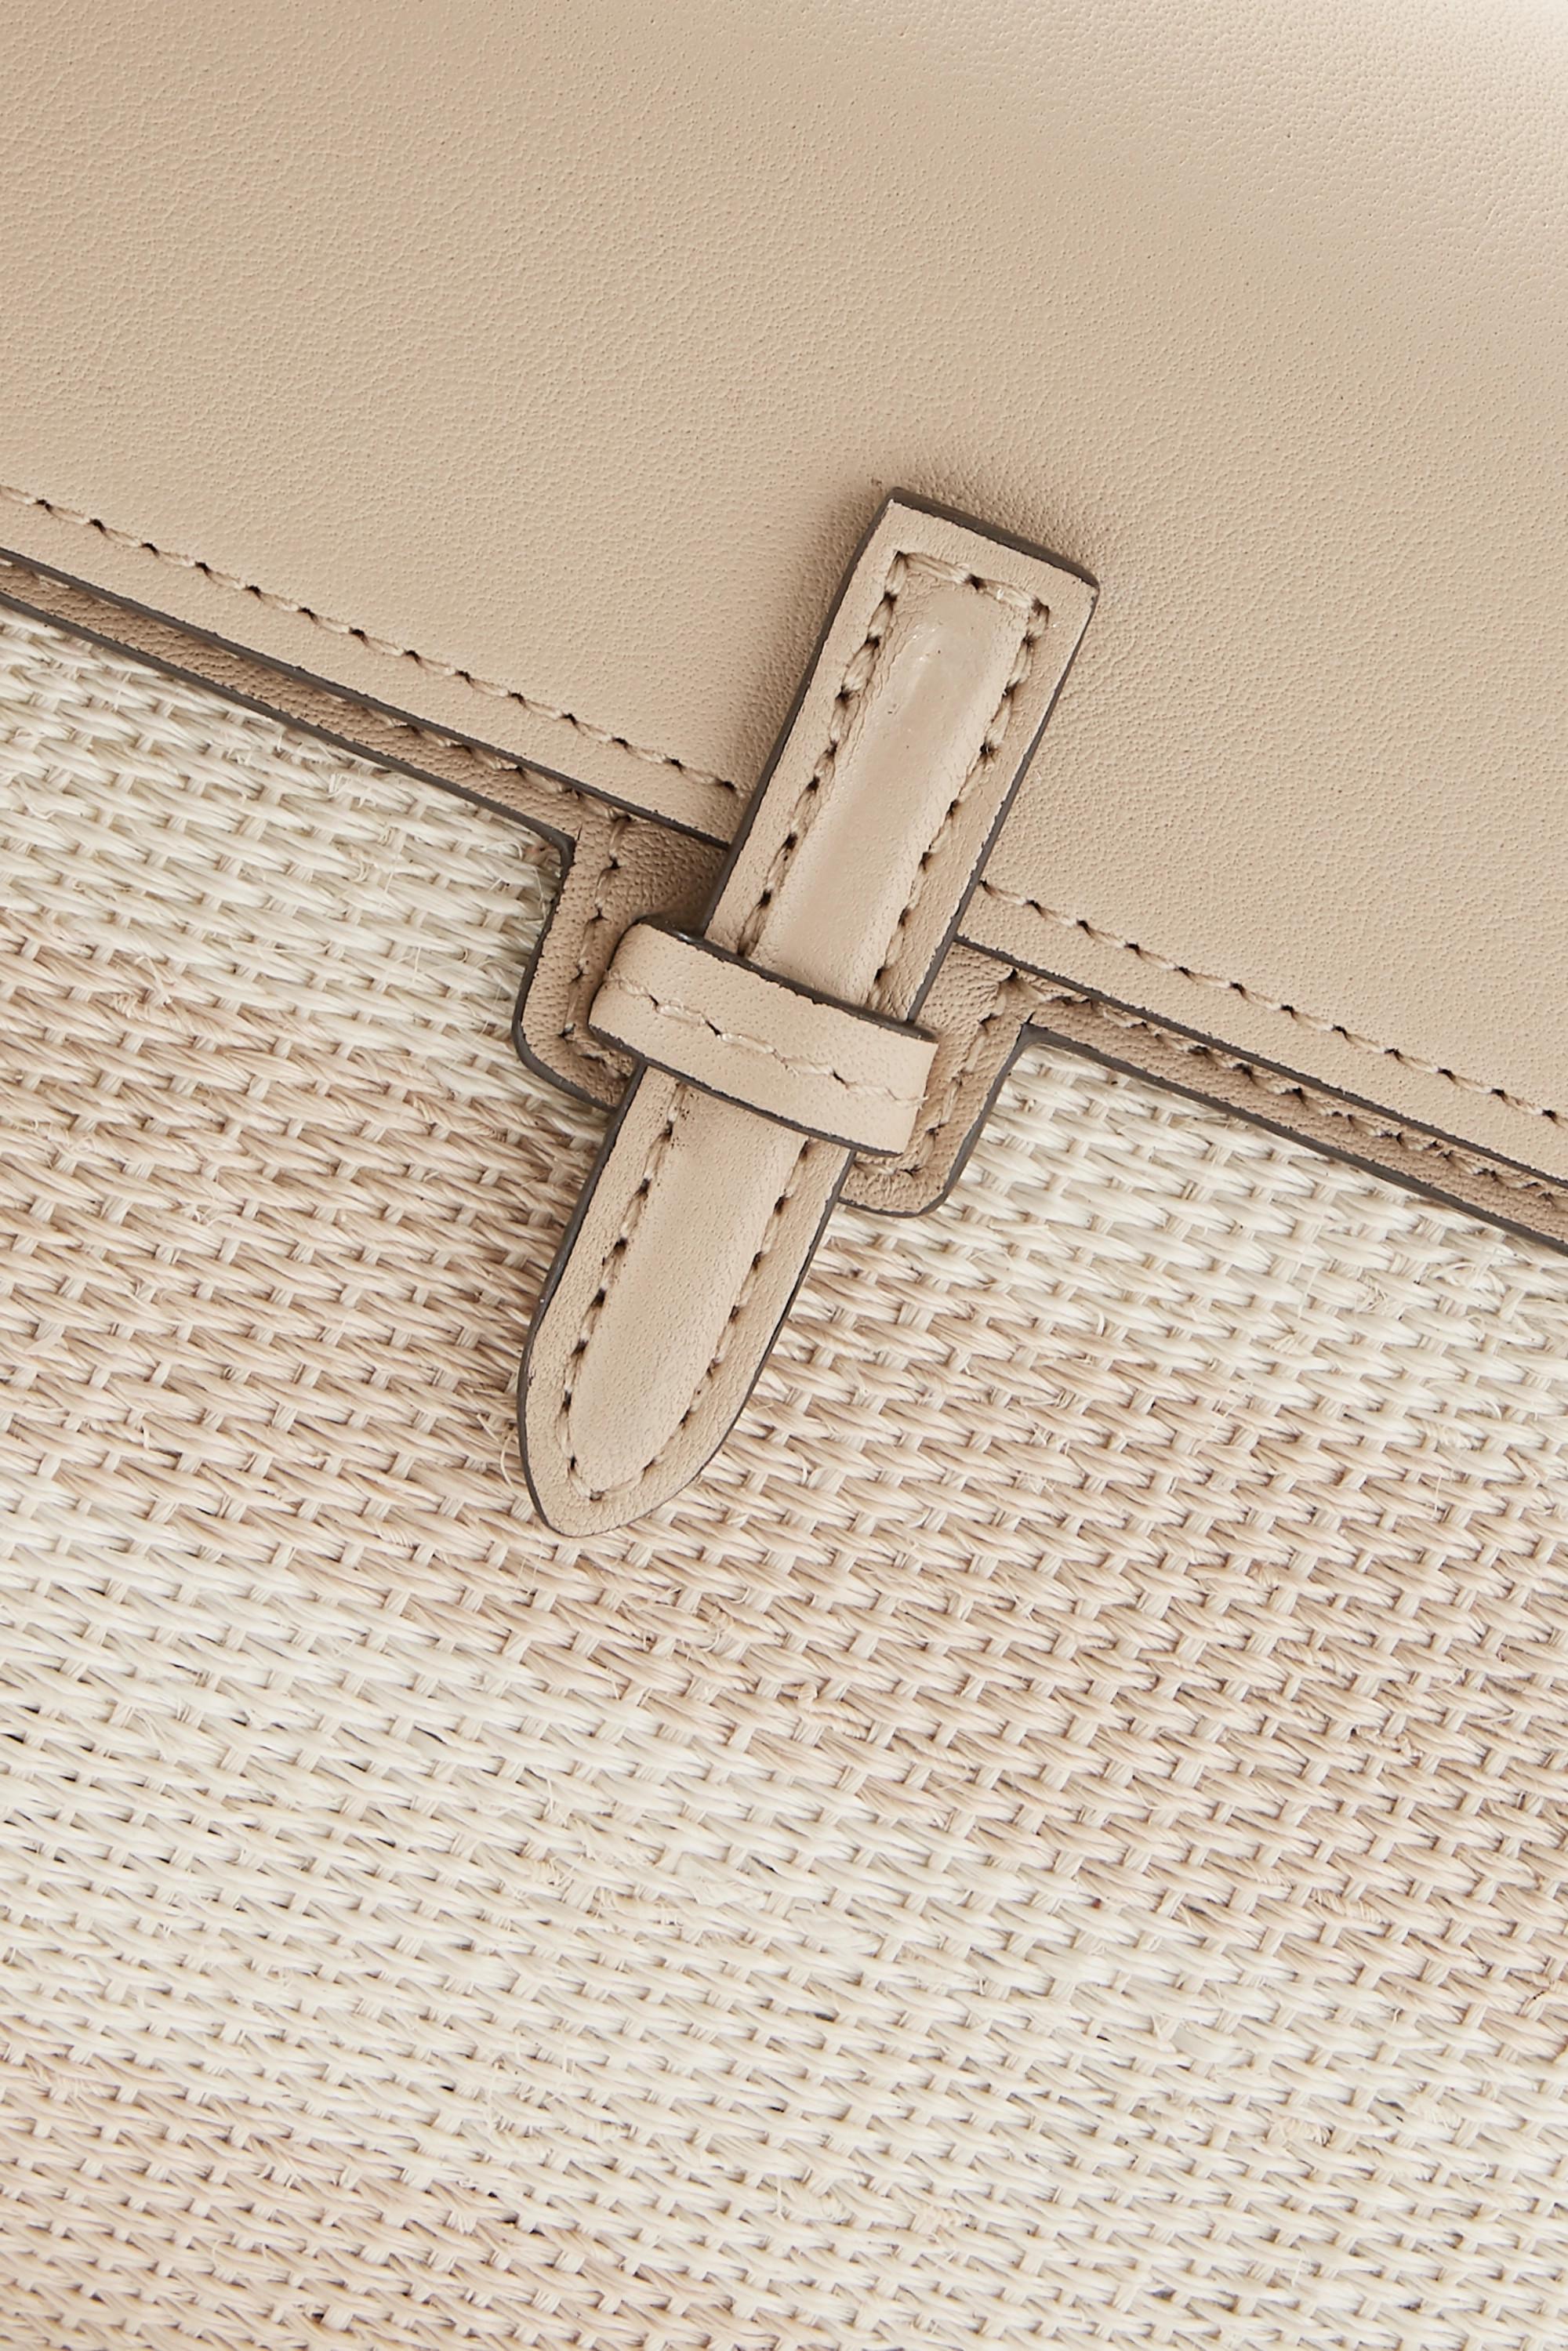 Hunting Season Leather and striped raffia clutch